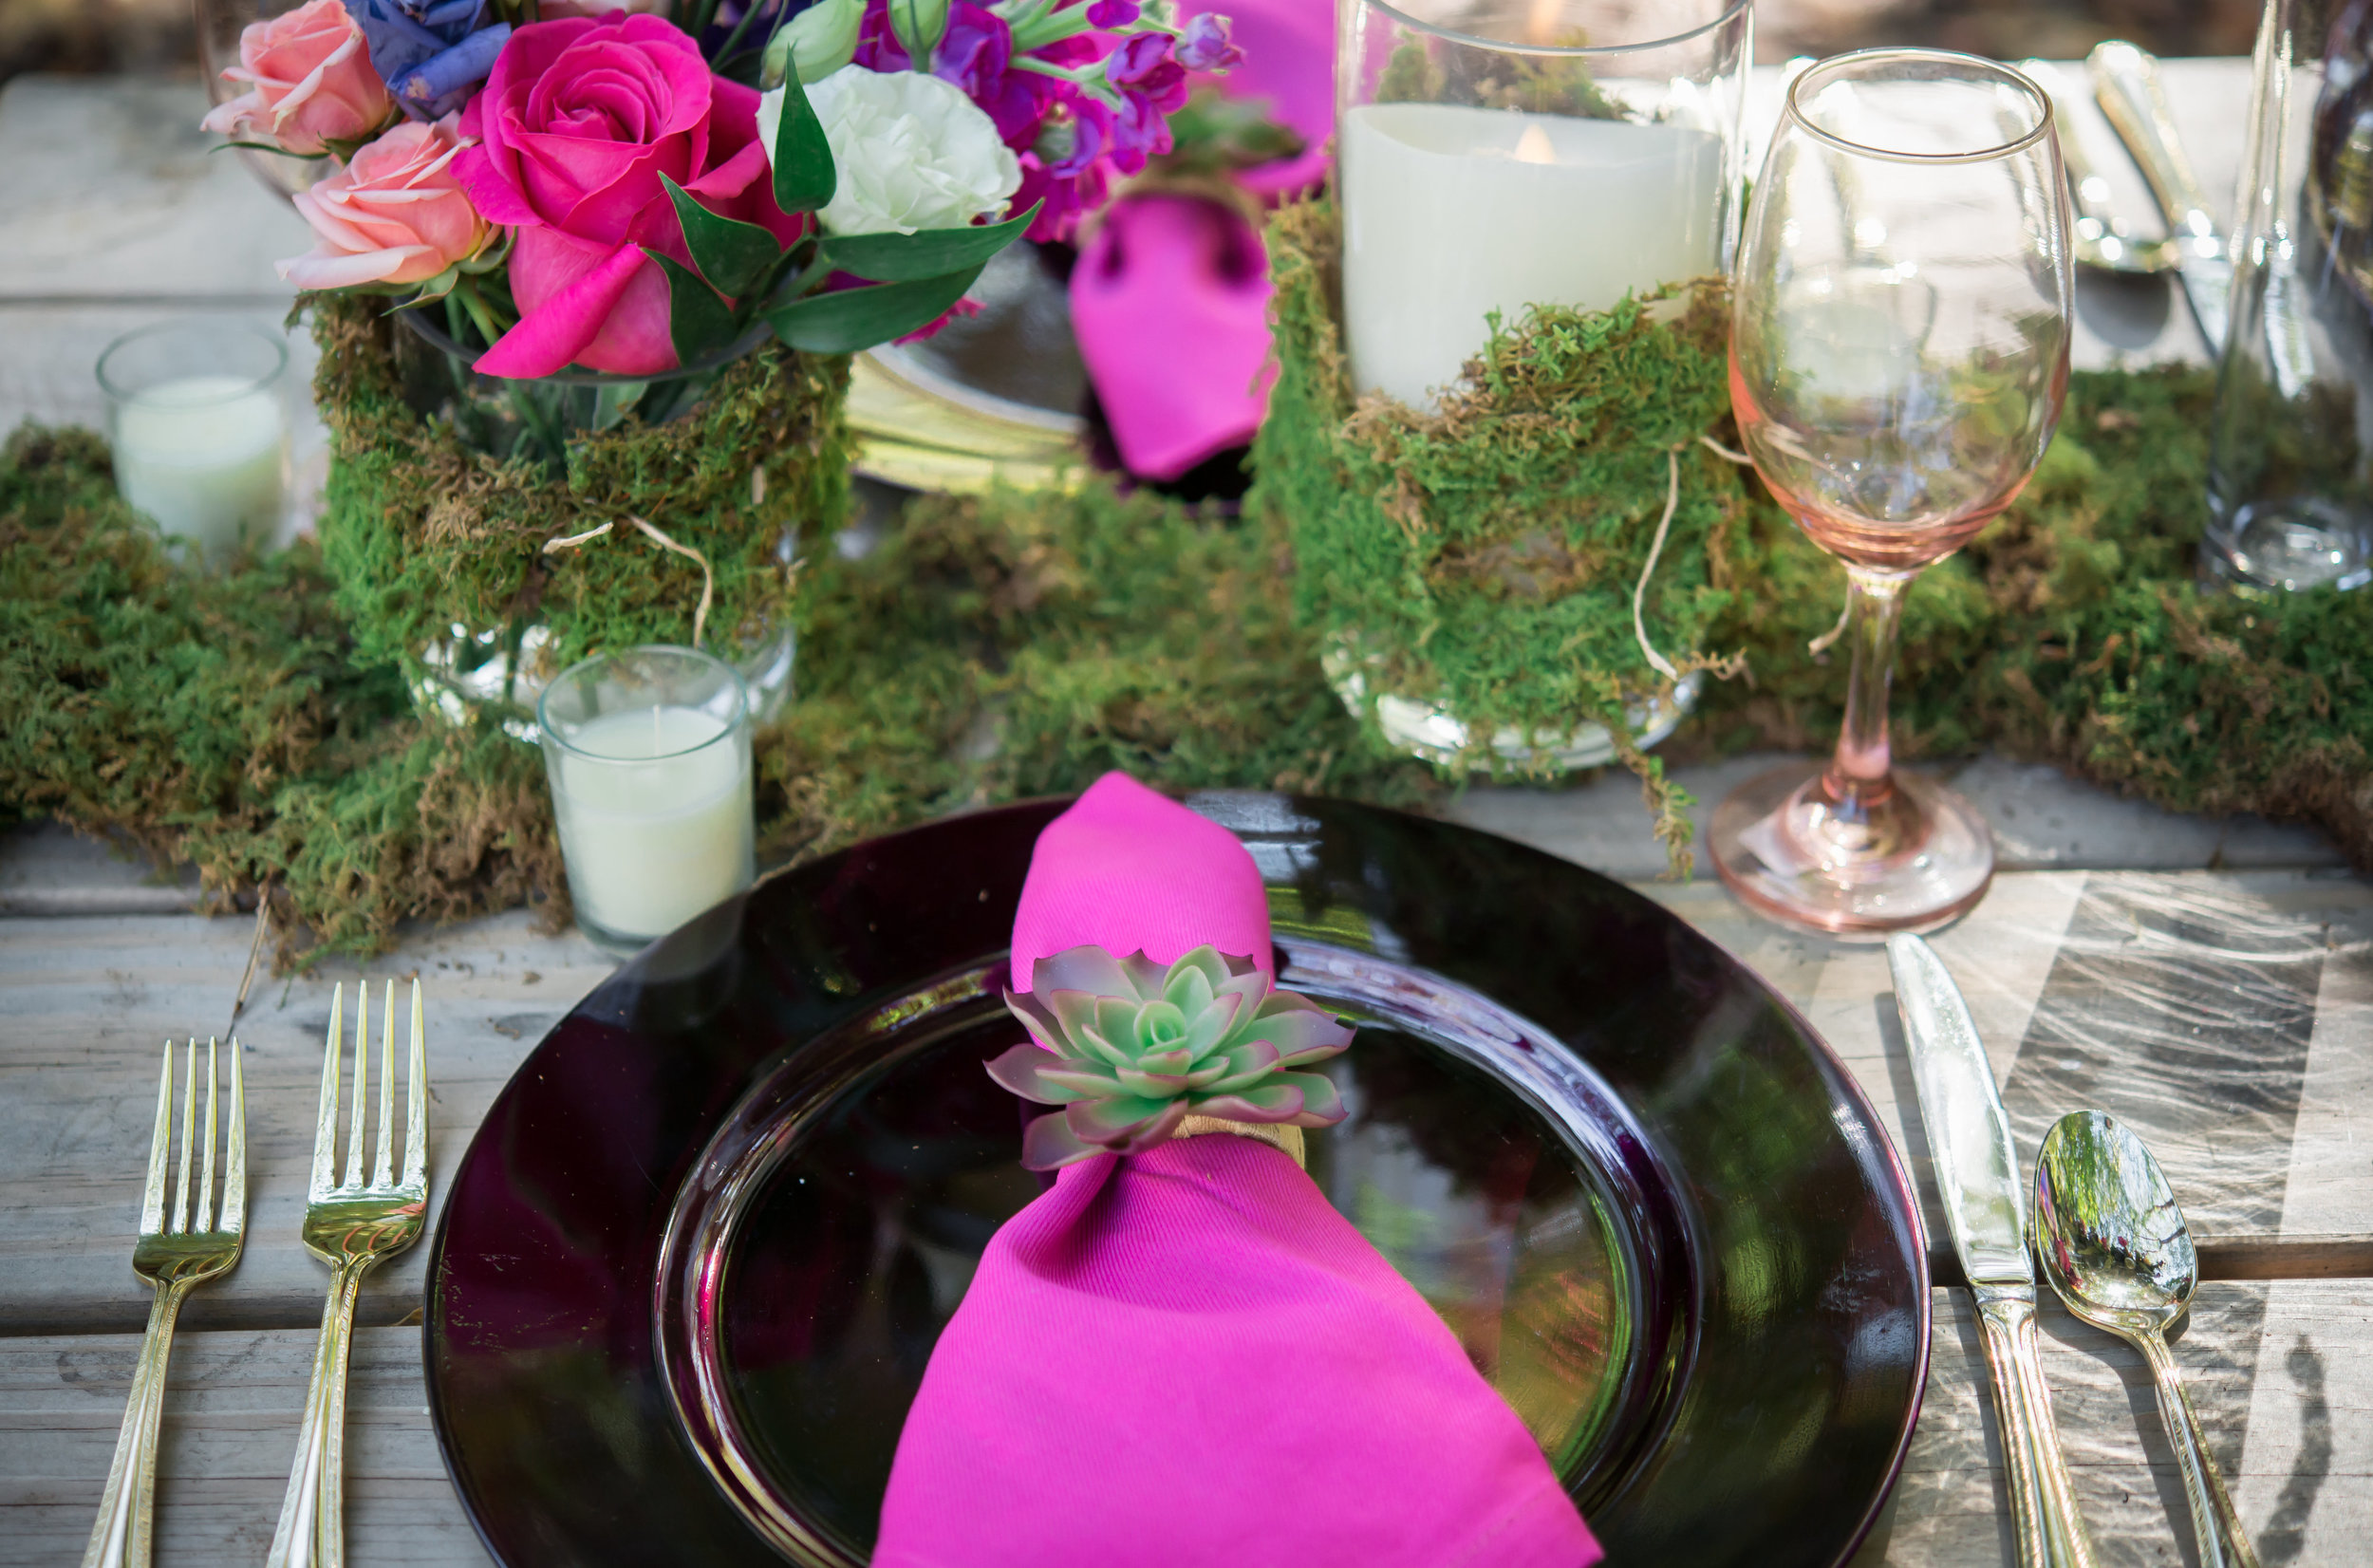 Pure Elegance Events Home Page Slideshow Image 24.jpg